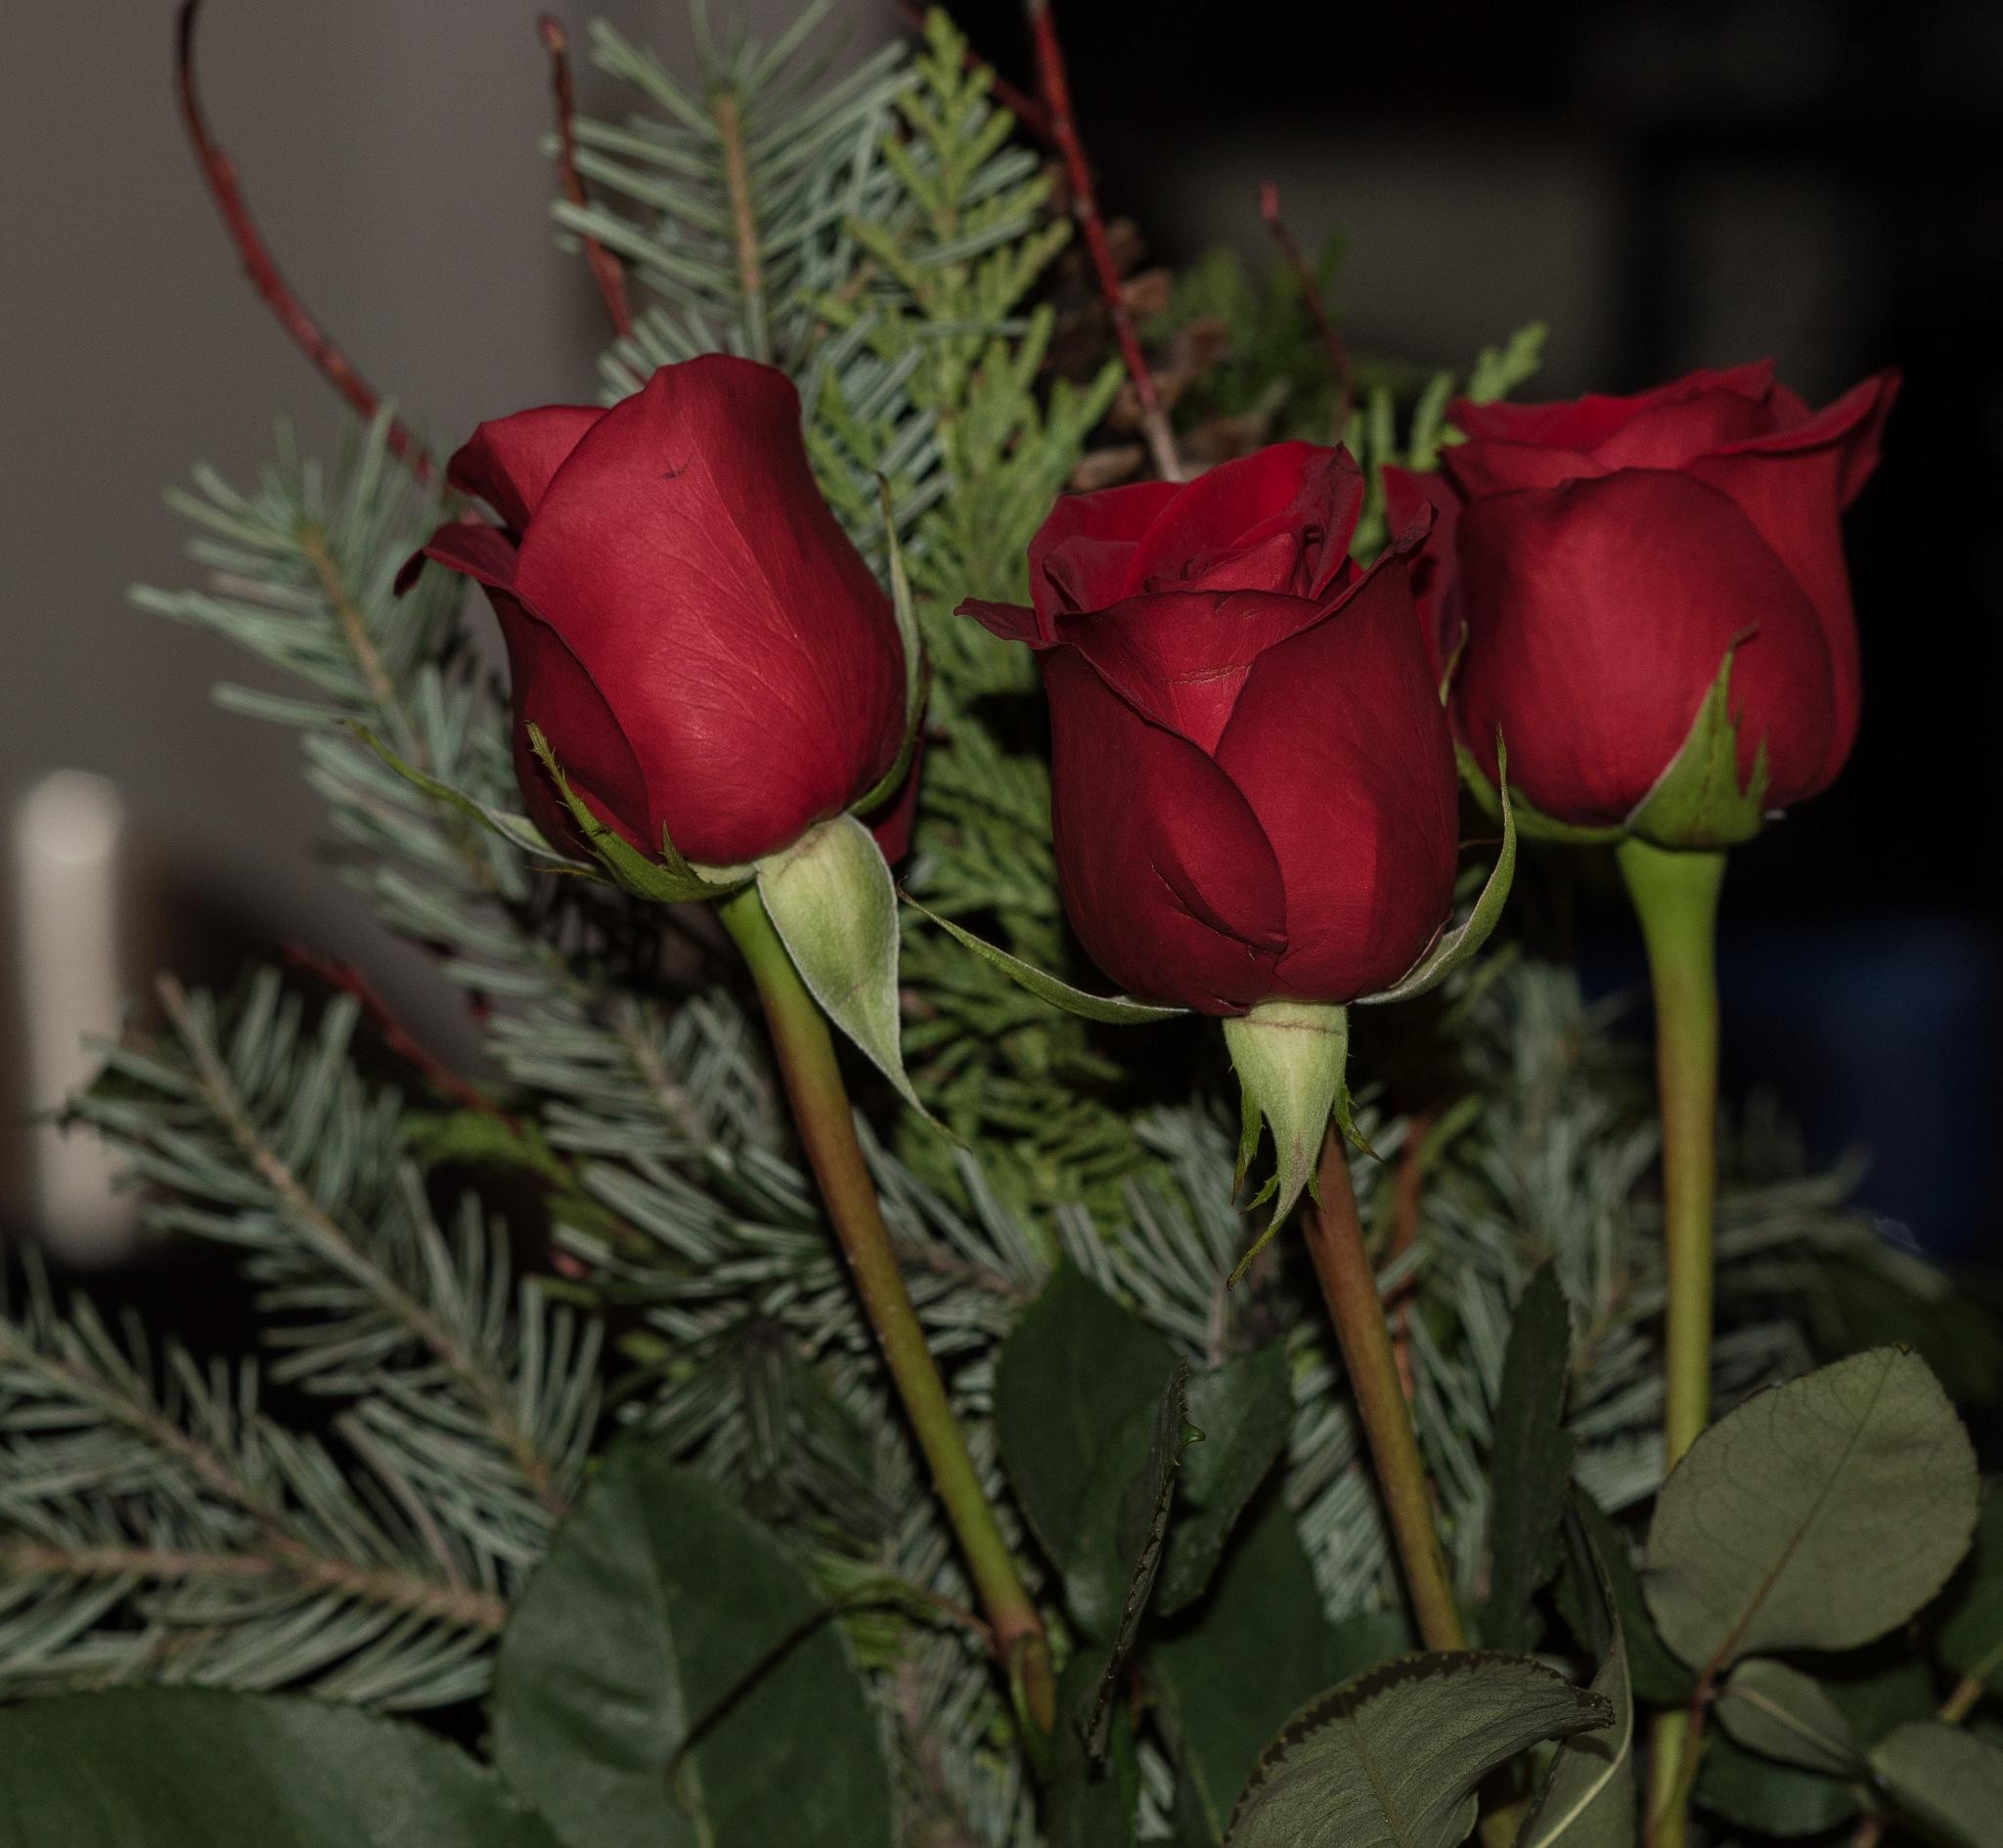 ROSES by DrJohnHodgson